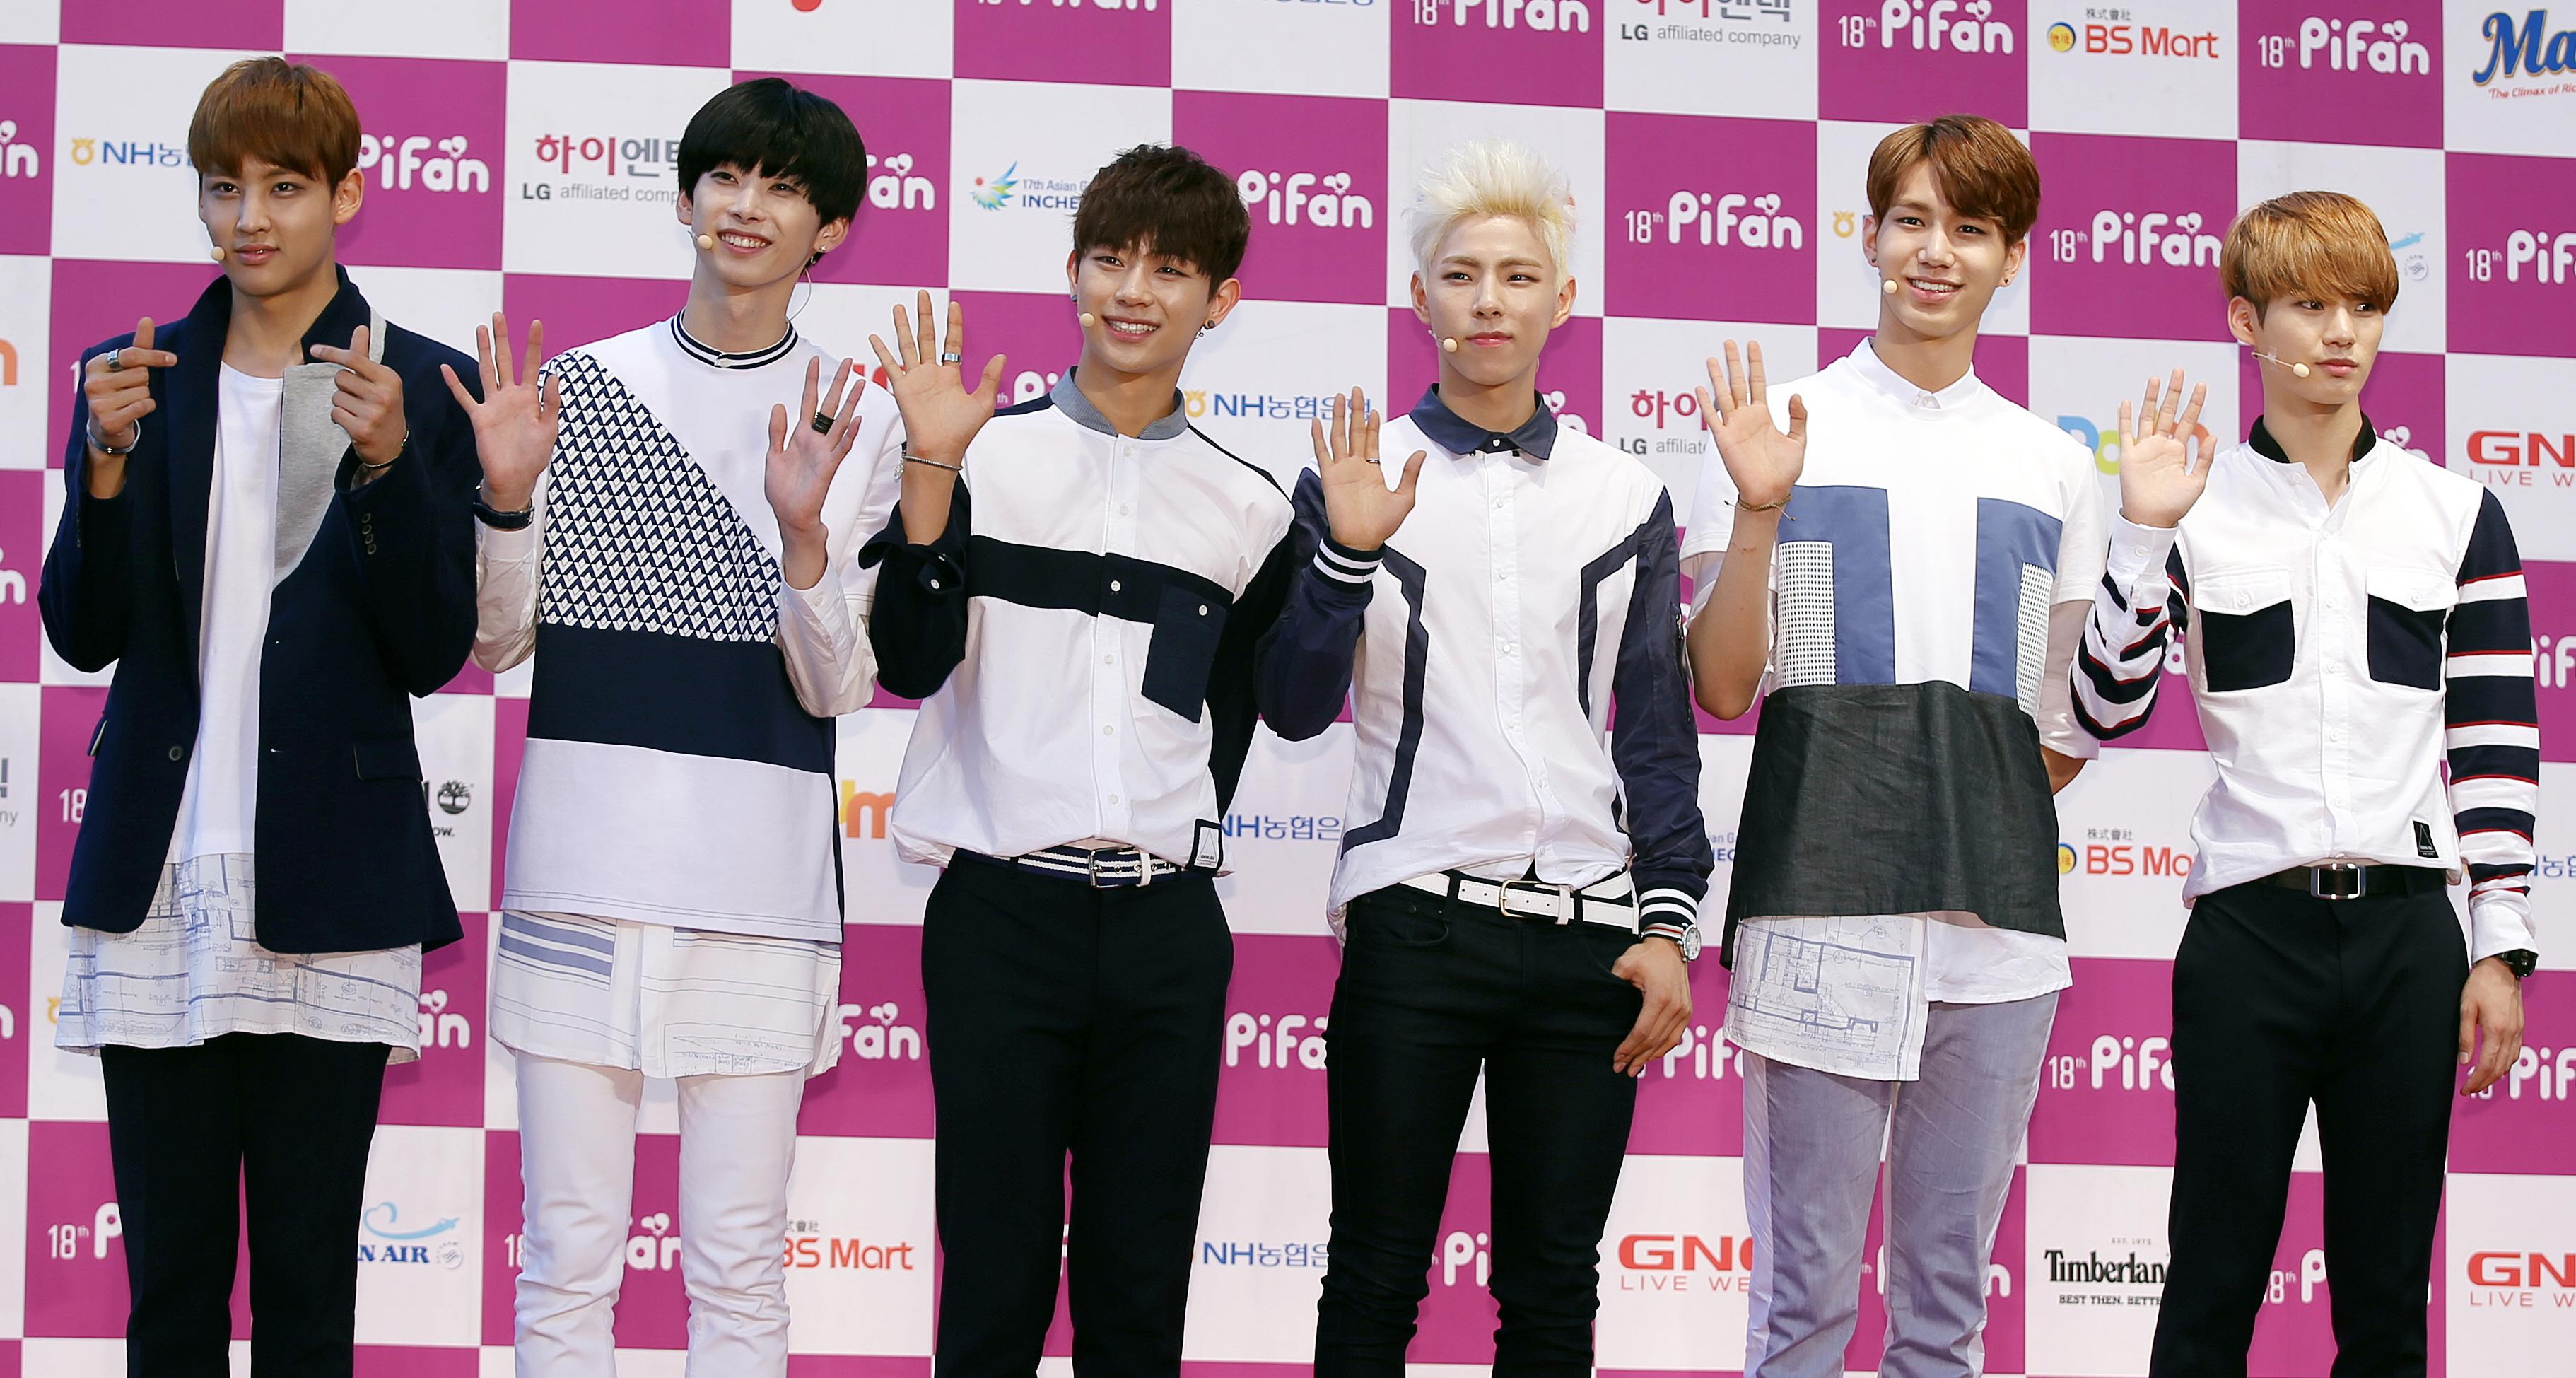 Idol kpop dating 2014